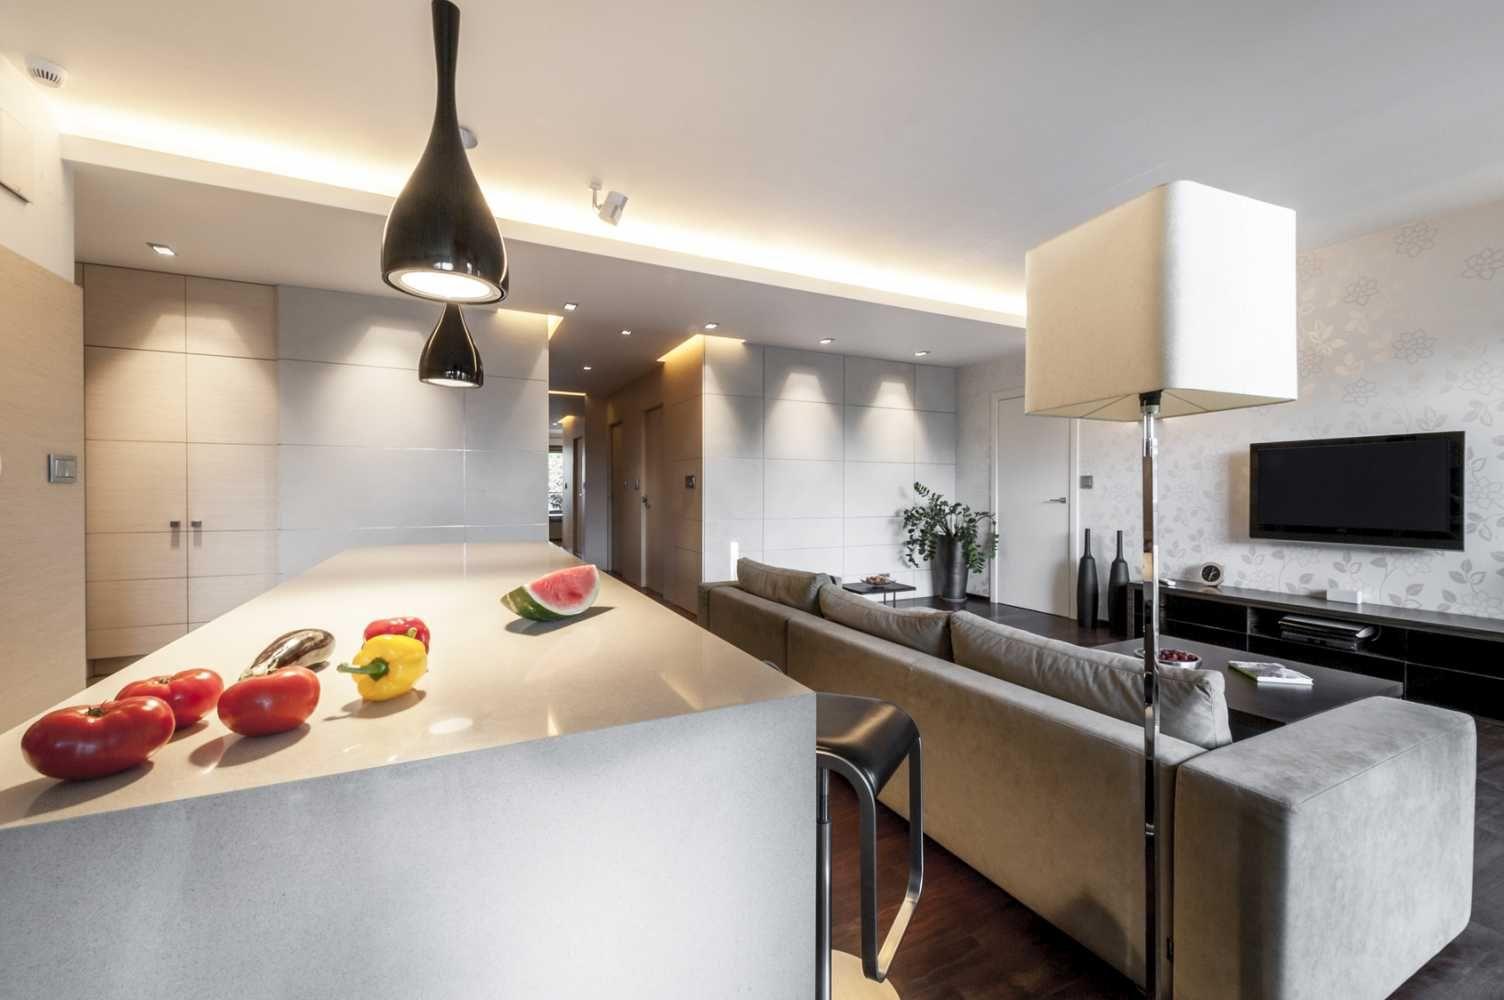 Pin by Jpsantaven on Kitchen | Home decor, Home, Kitchen